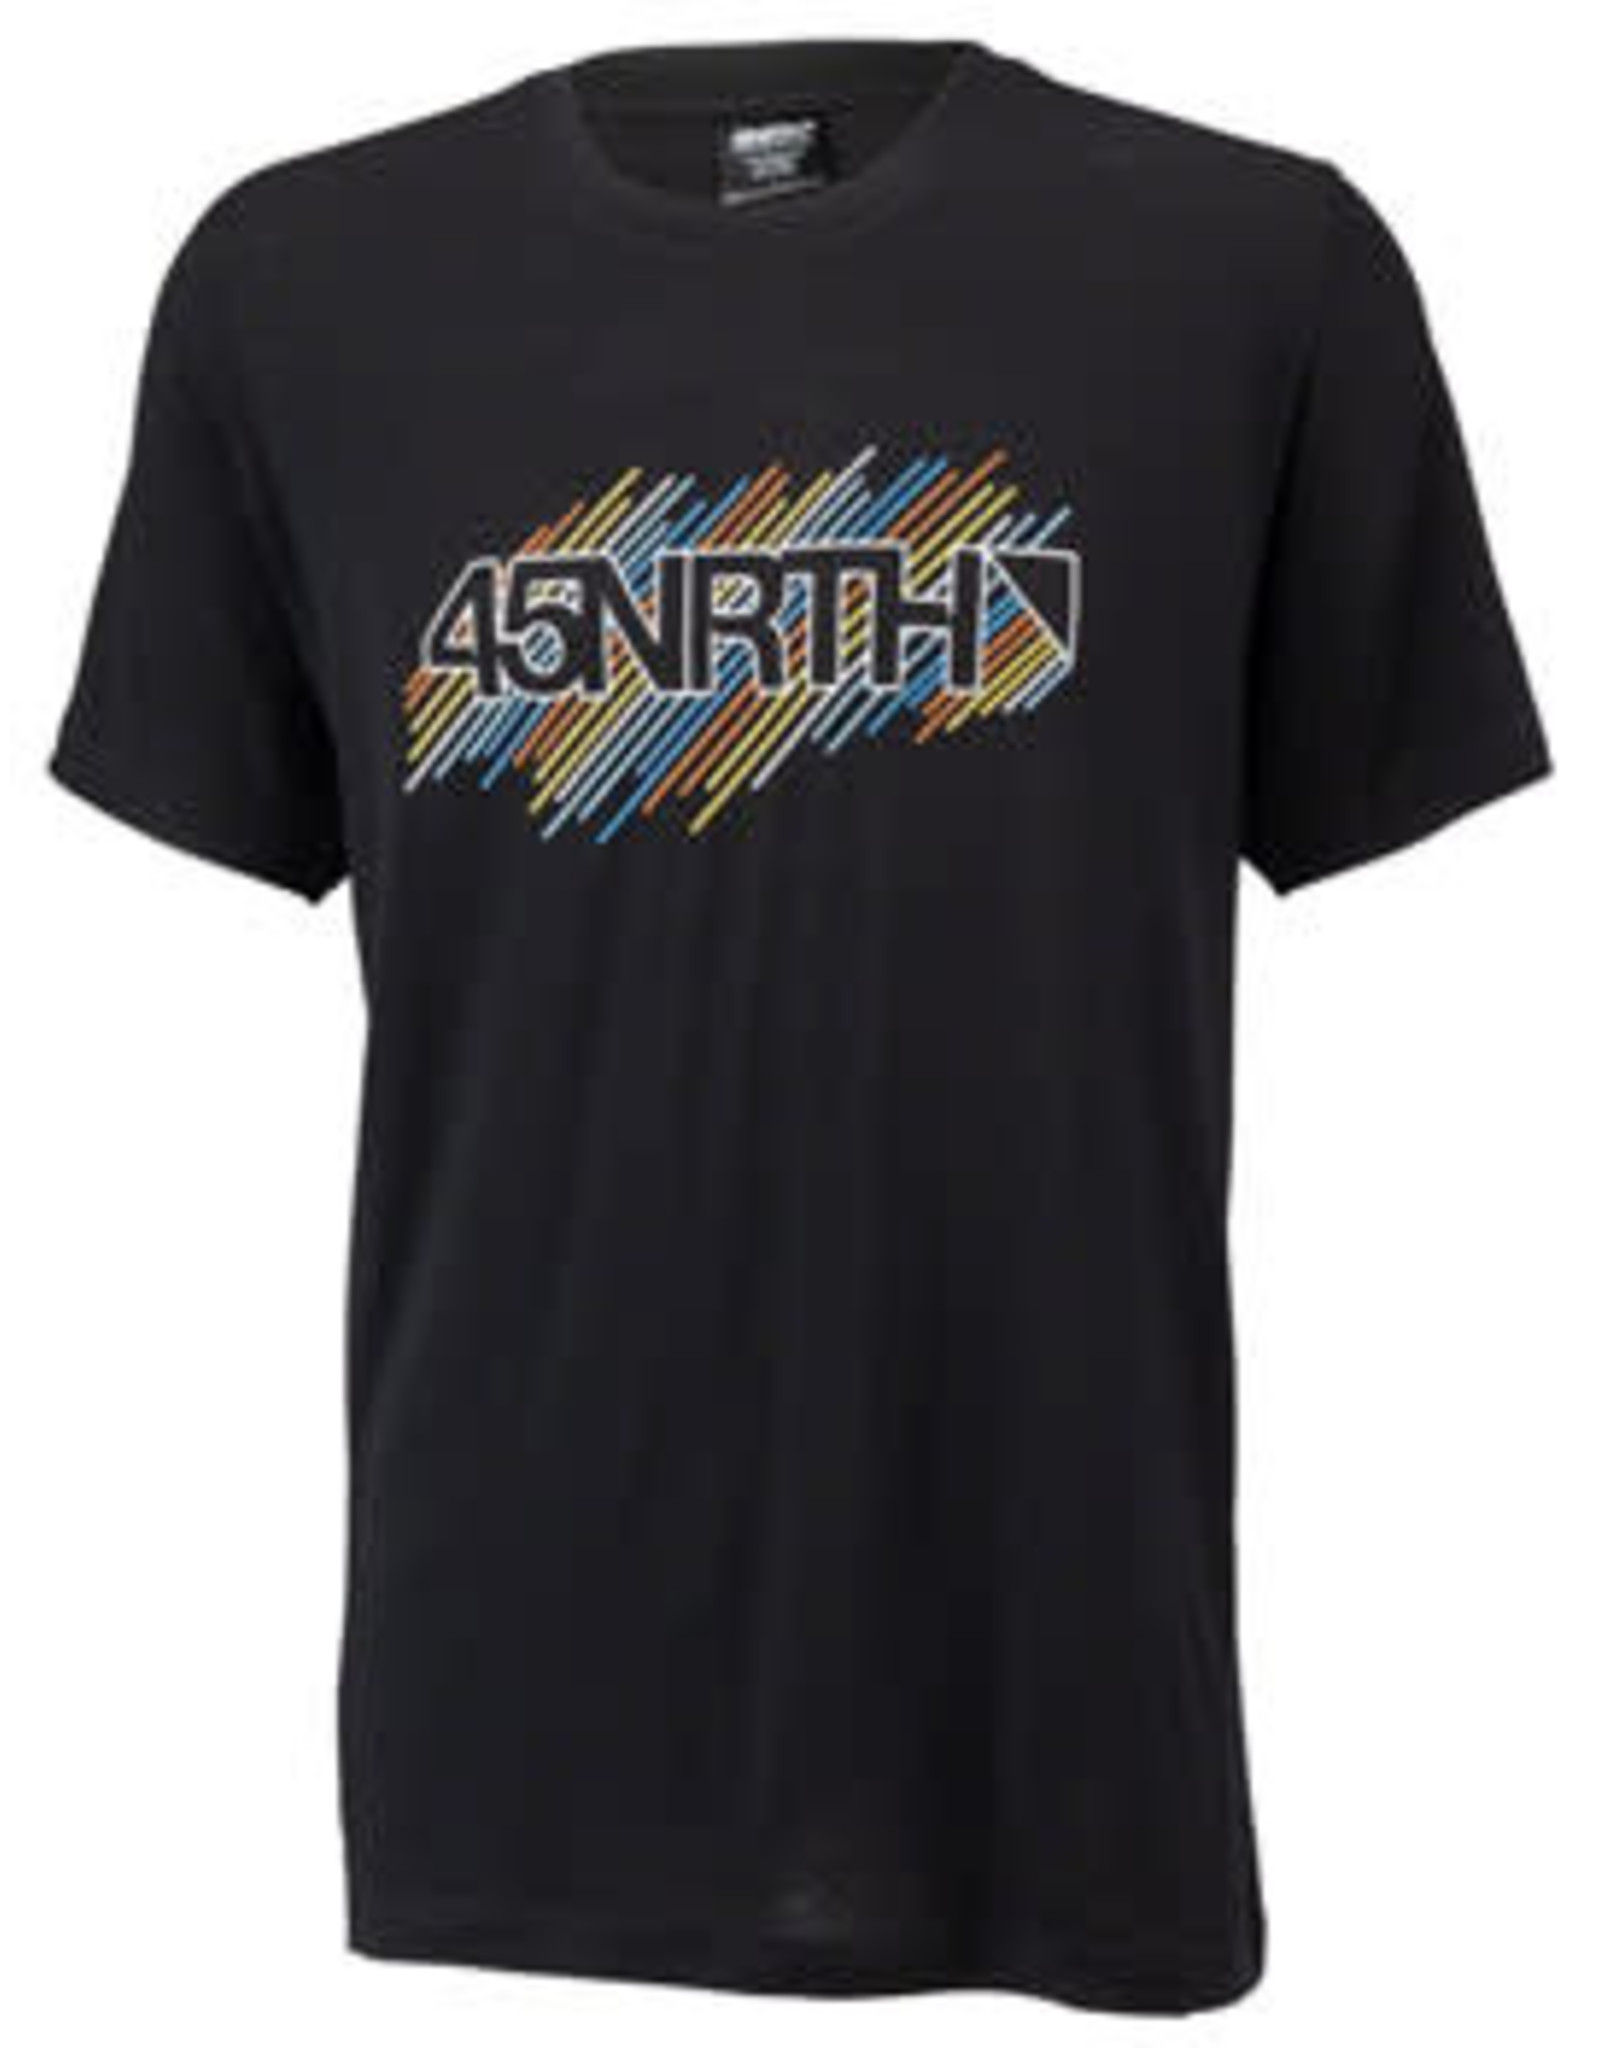 45NRTH 45NRTH Men's Diffuser Wool T-shirt